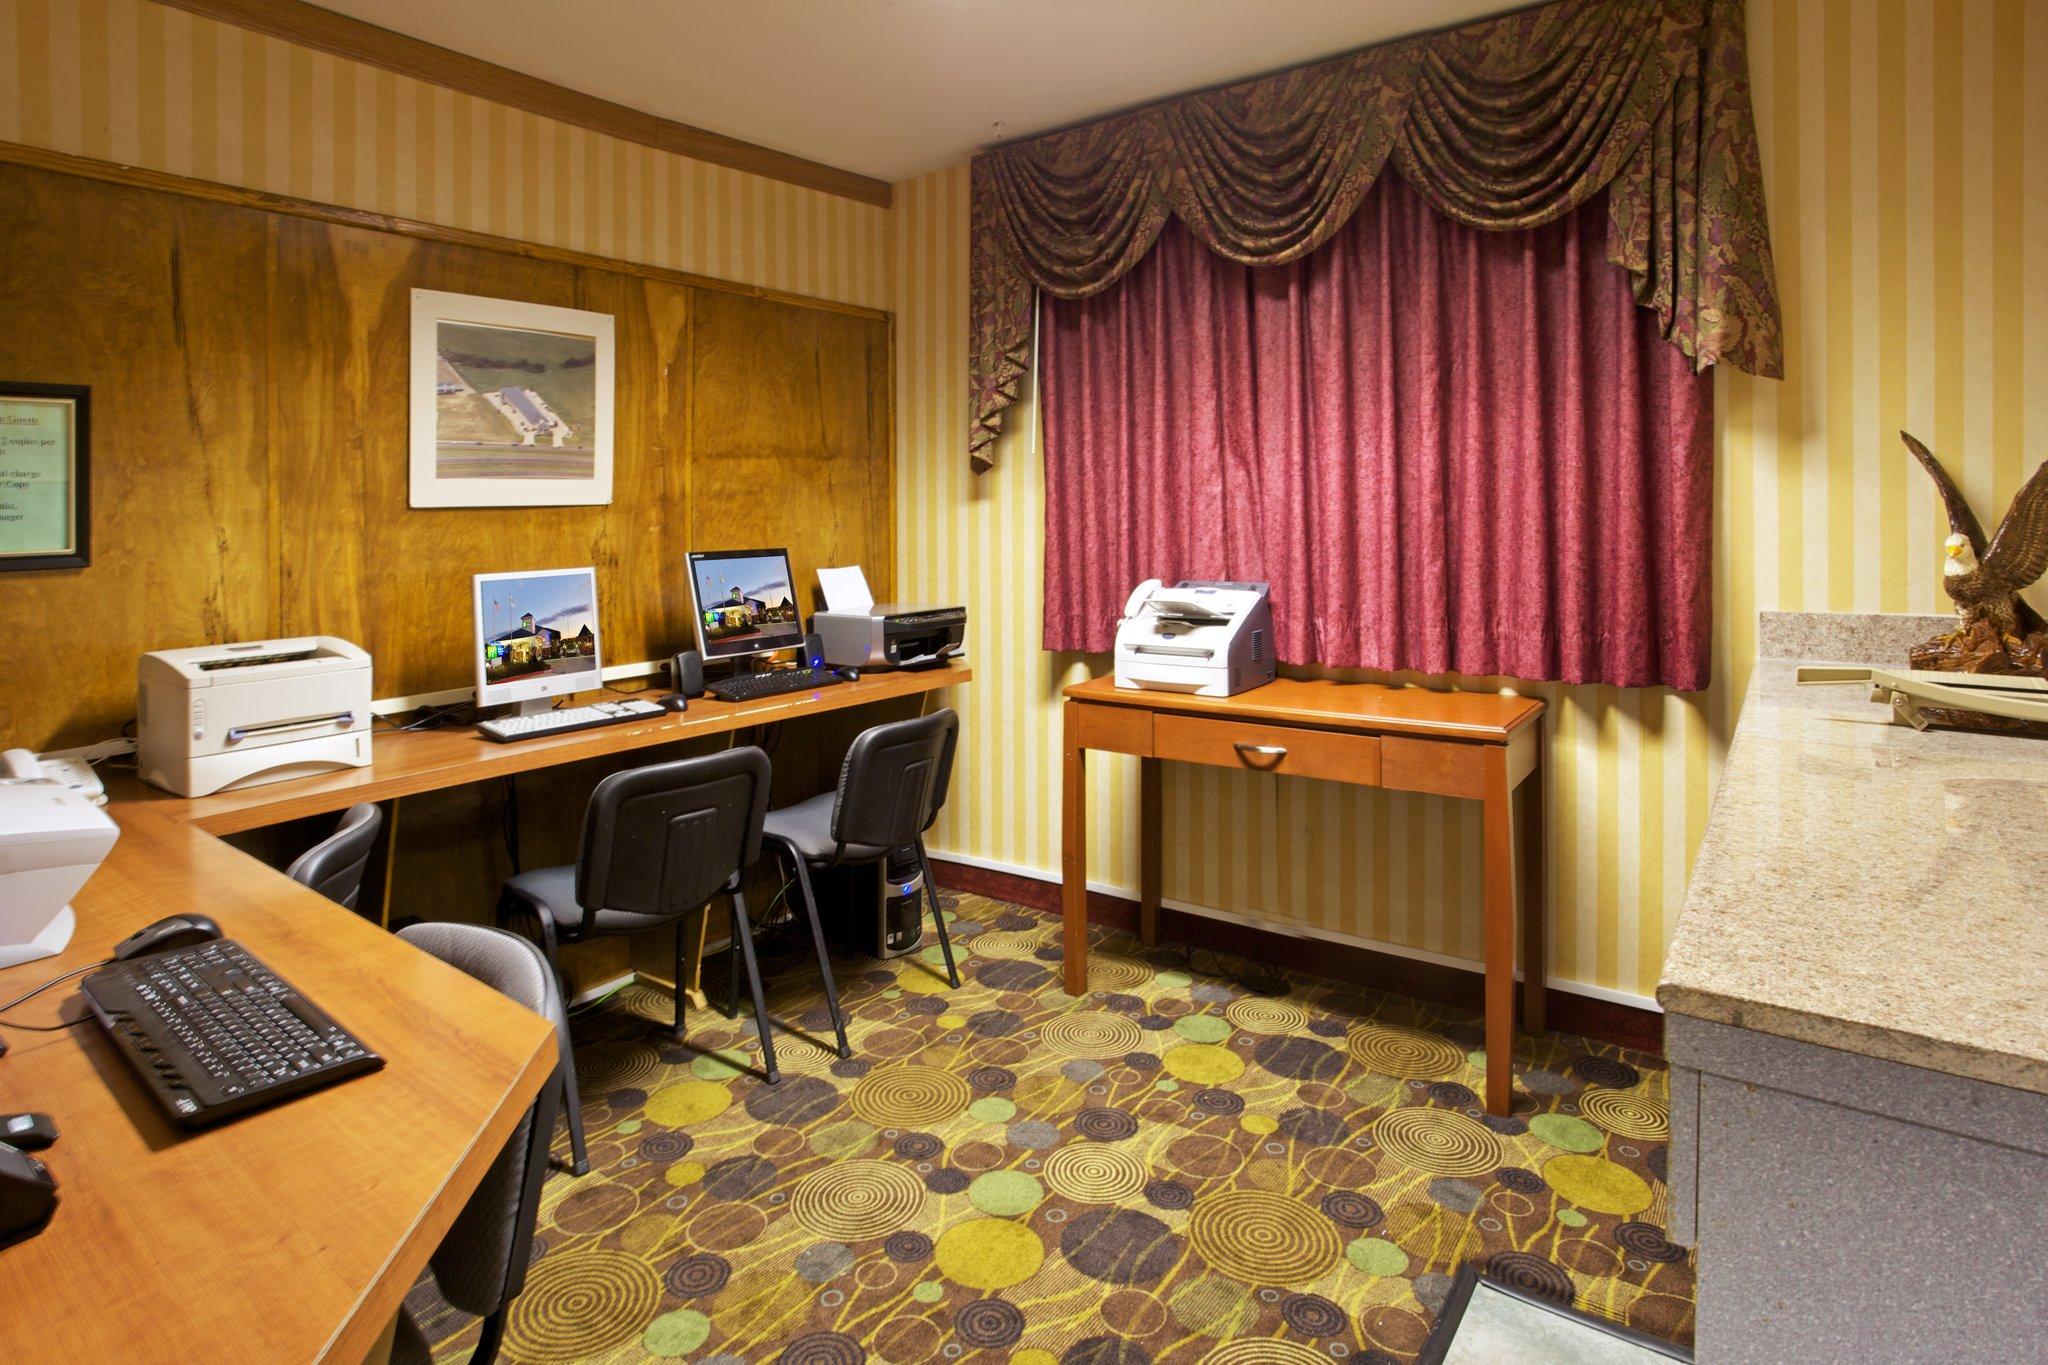 Holiday Inn Express Hotel & Suites BRENHAM